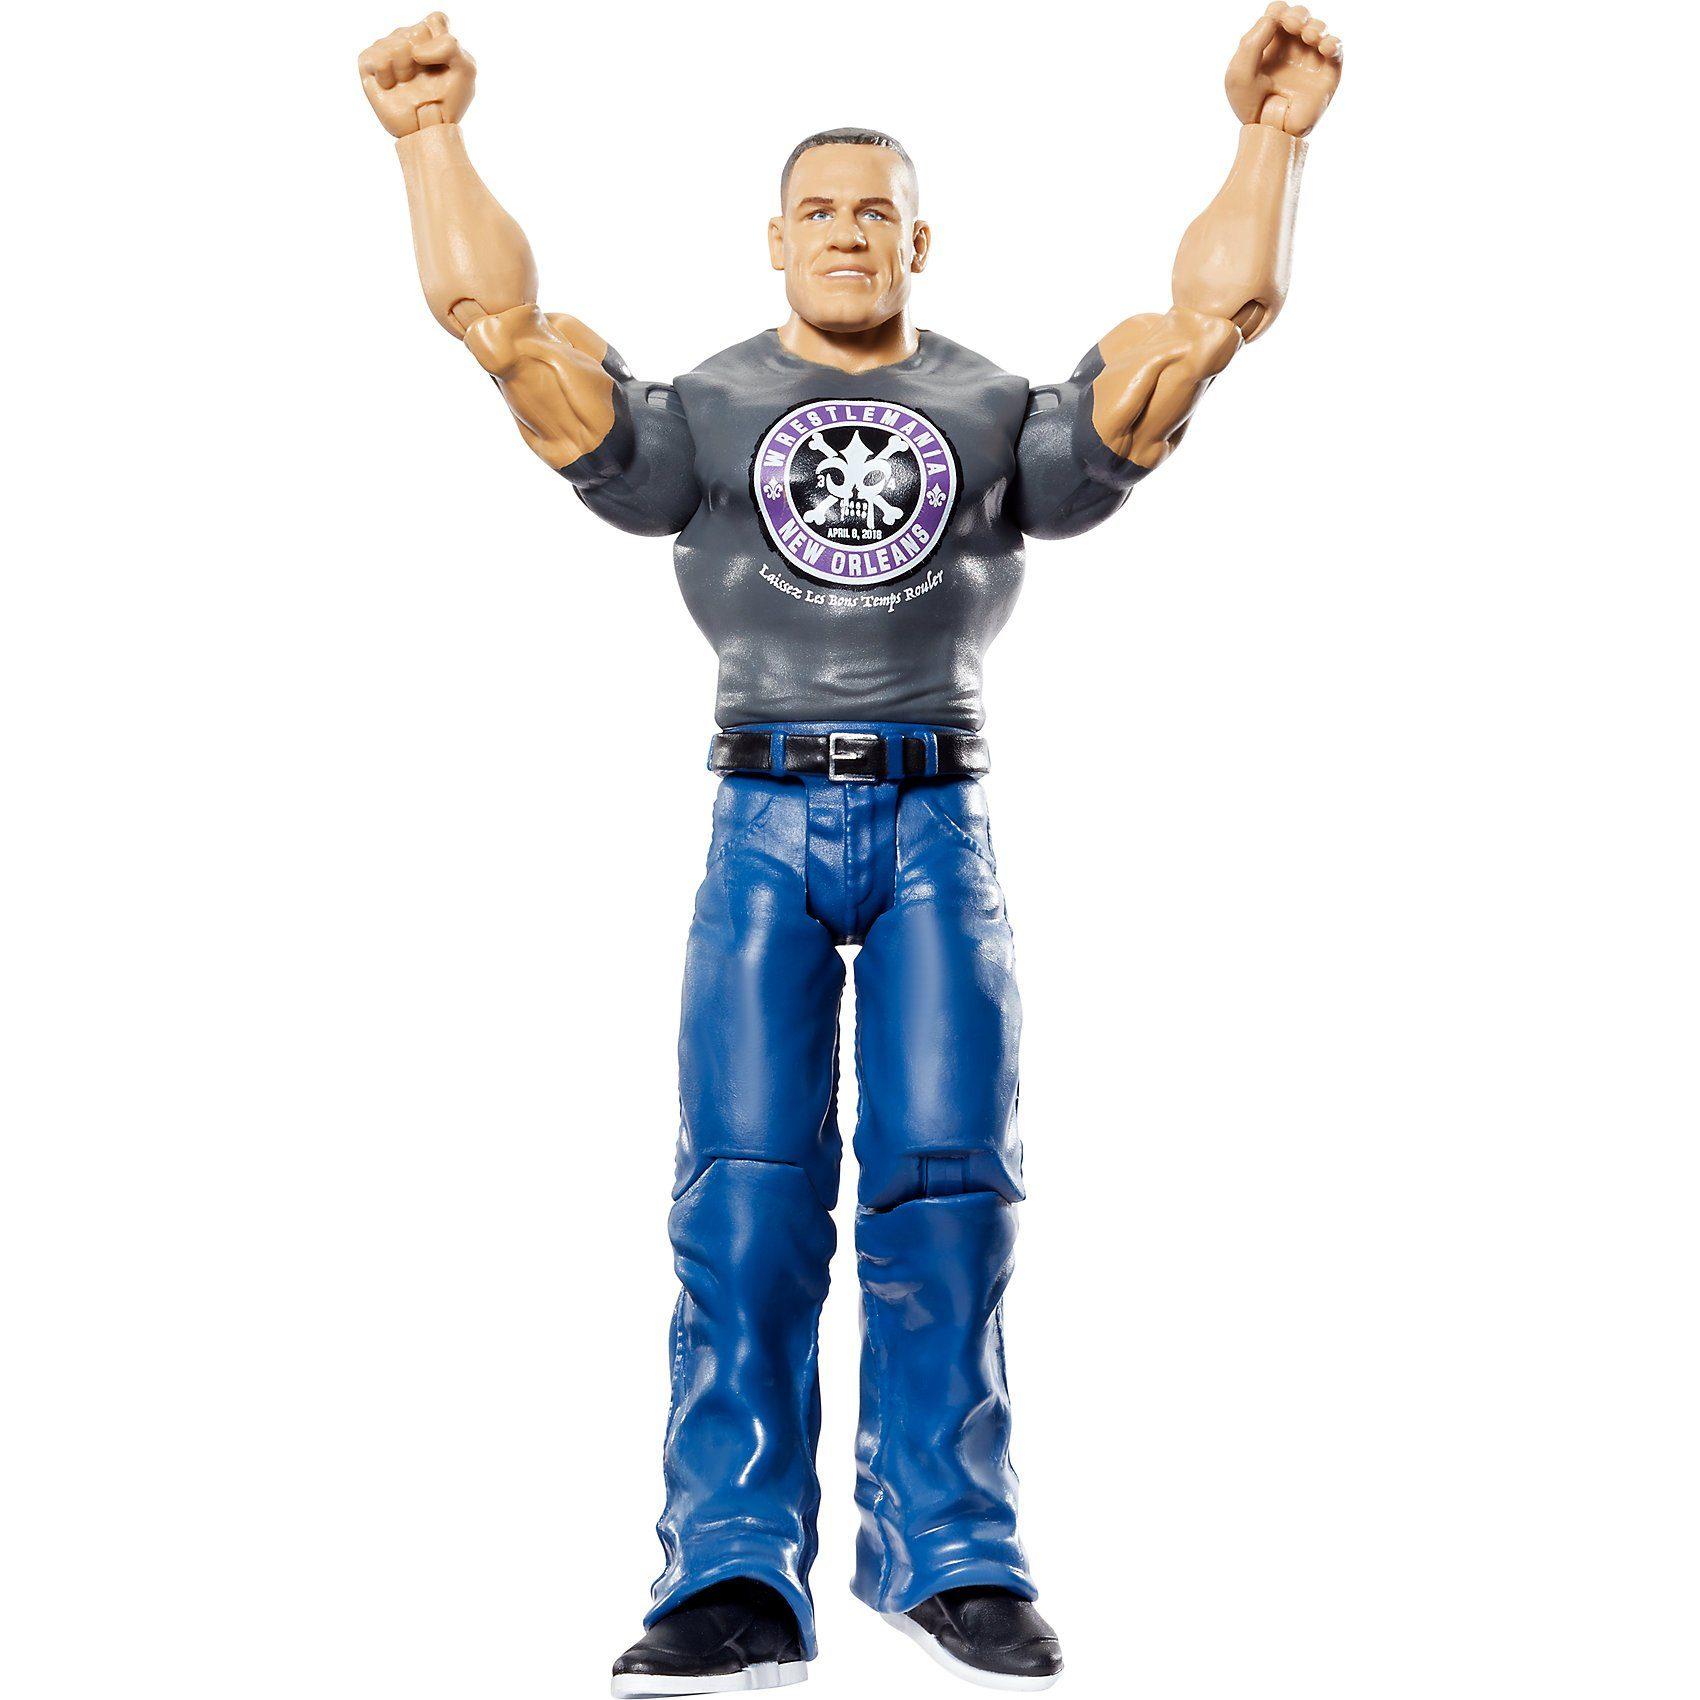 Mattel® WWE WrestleMania Figur (15 cm) John Cena